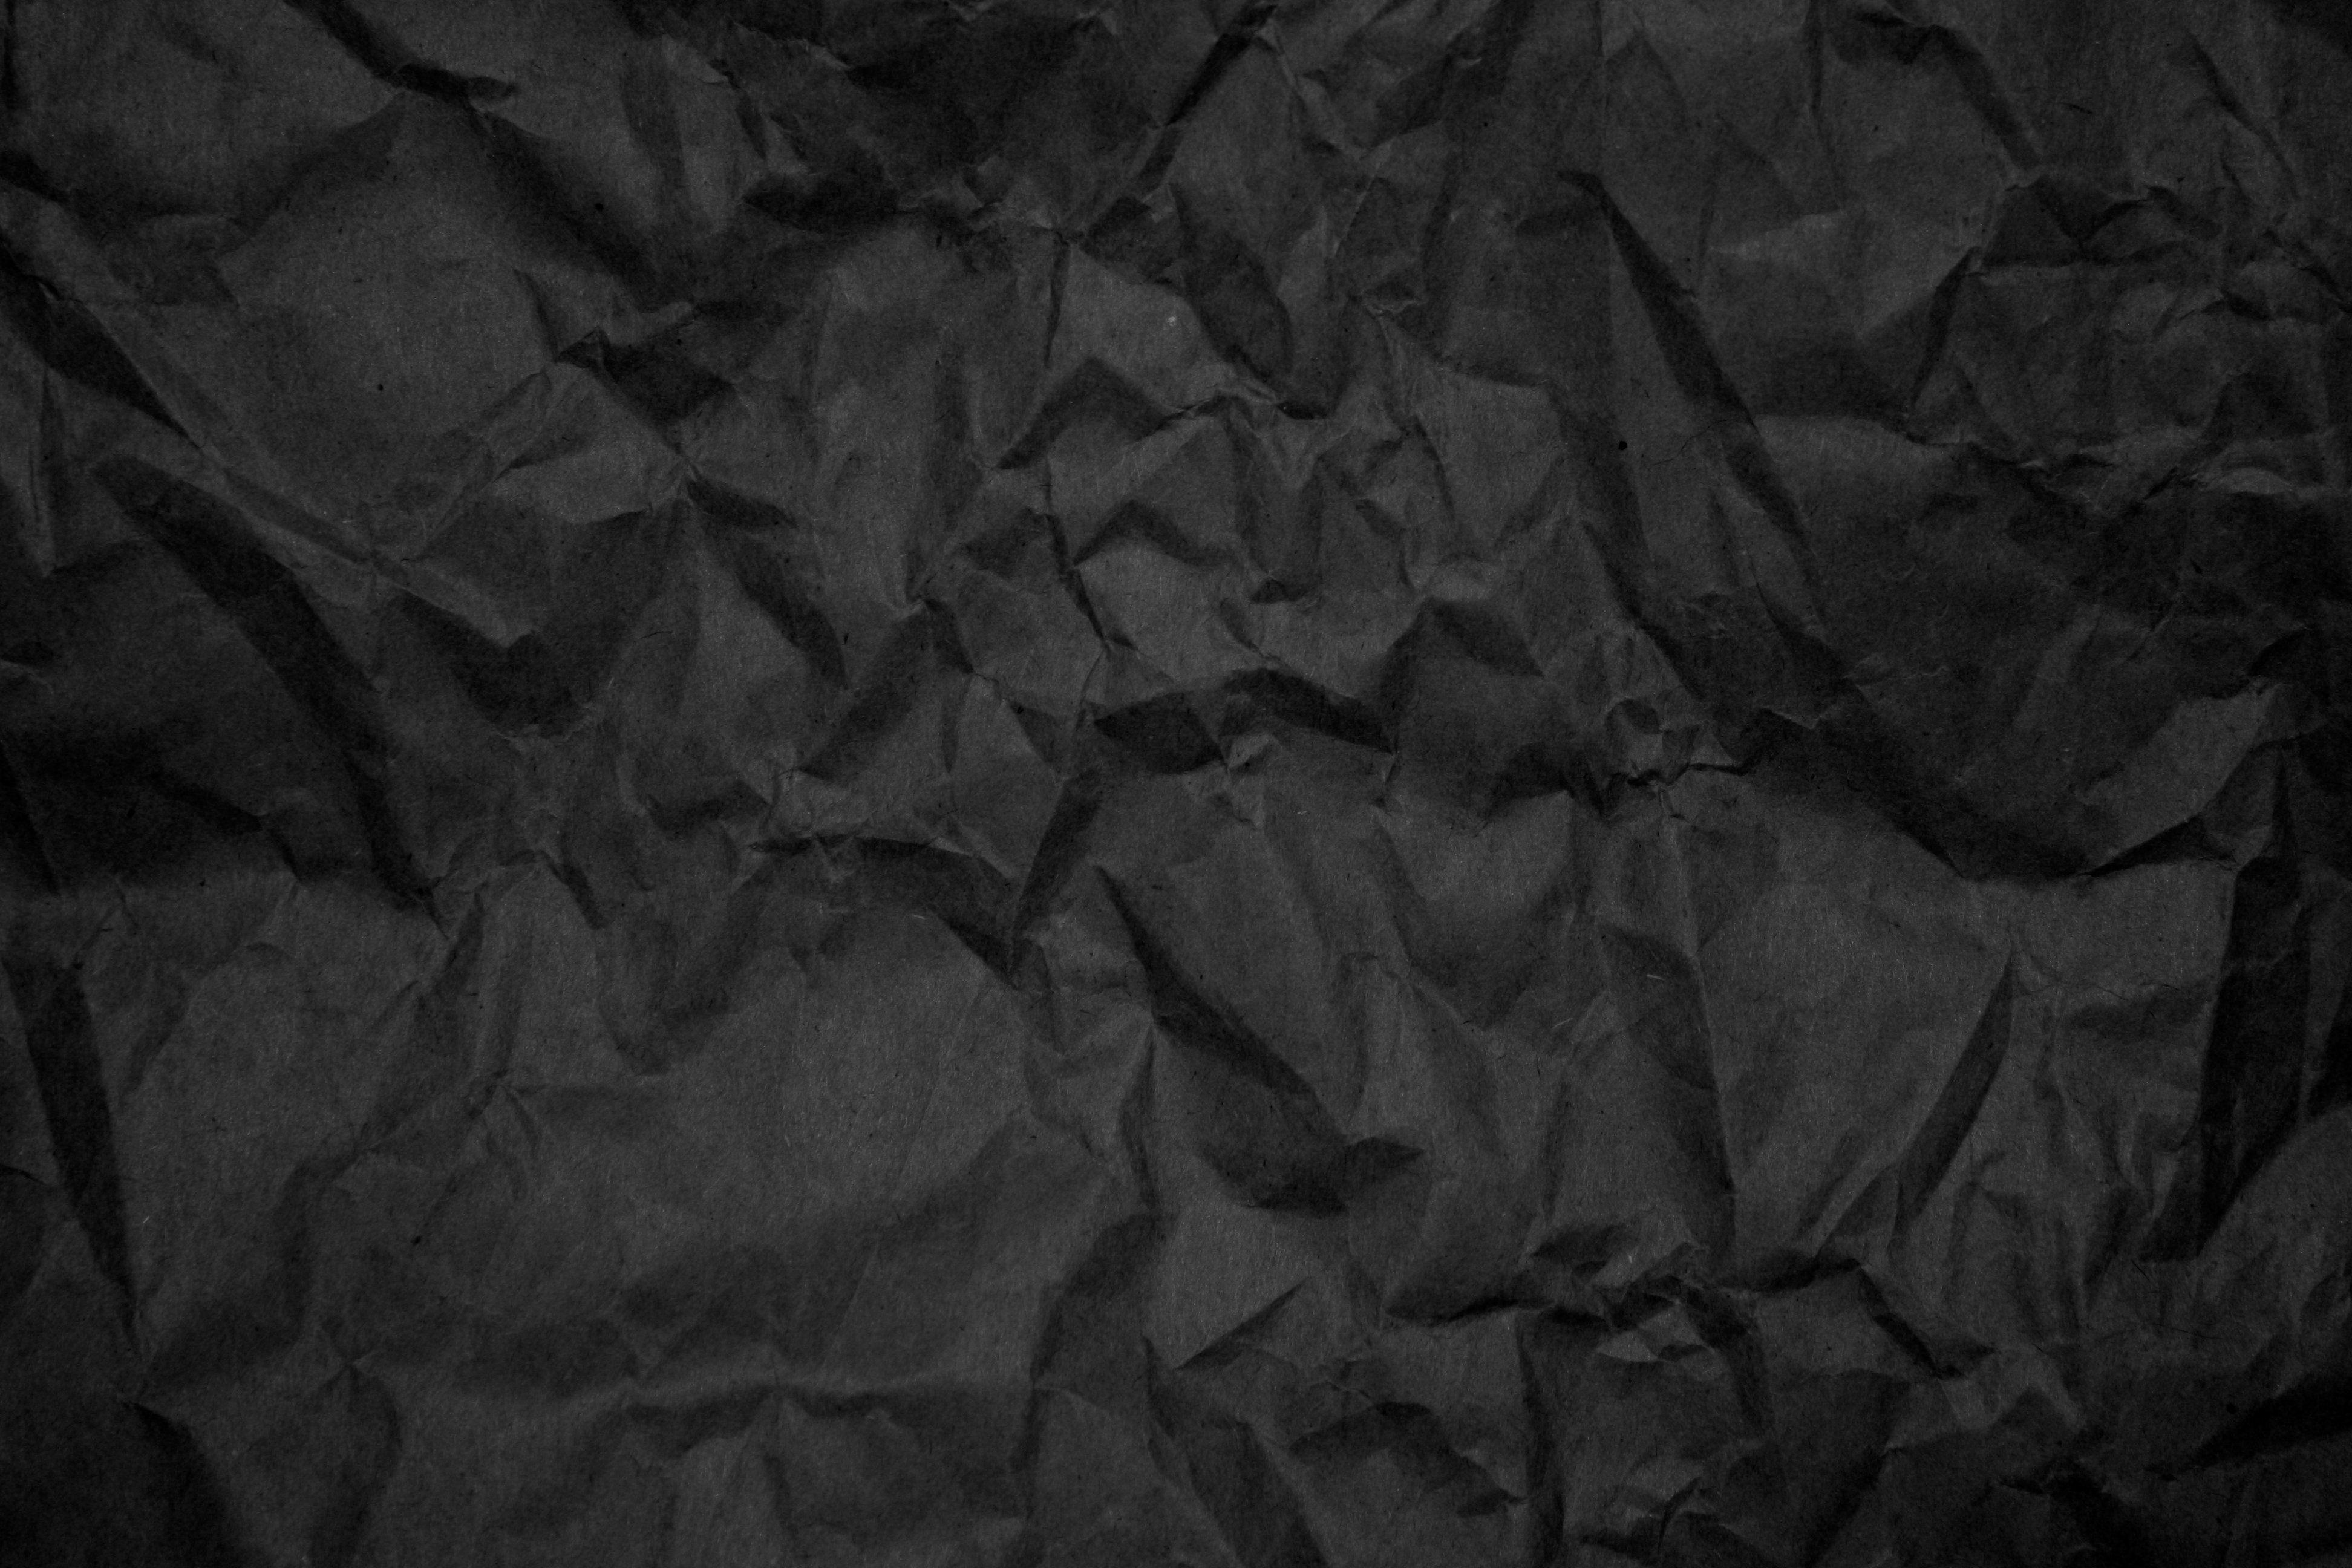 Crumpled Black Paper Texture | Material | Pinterest | Black paper ...